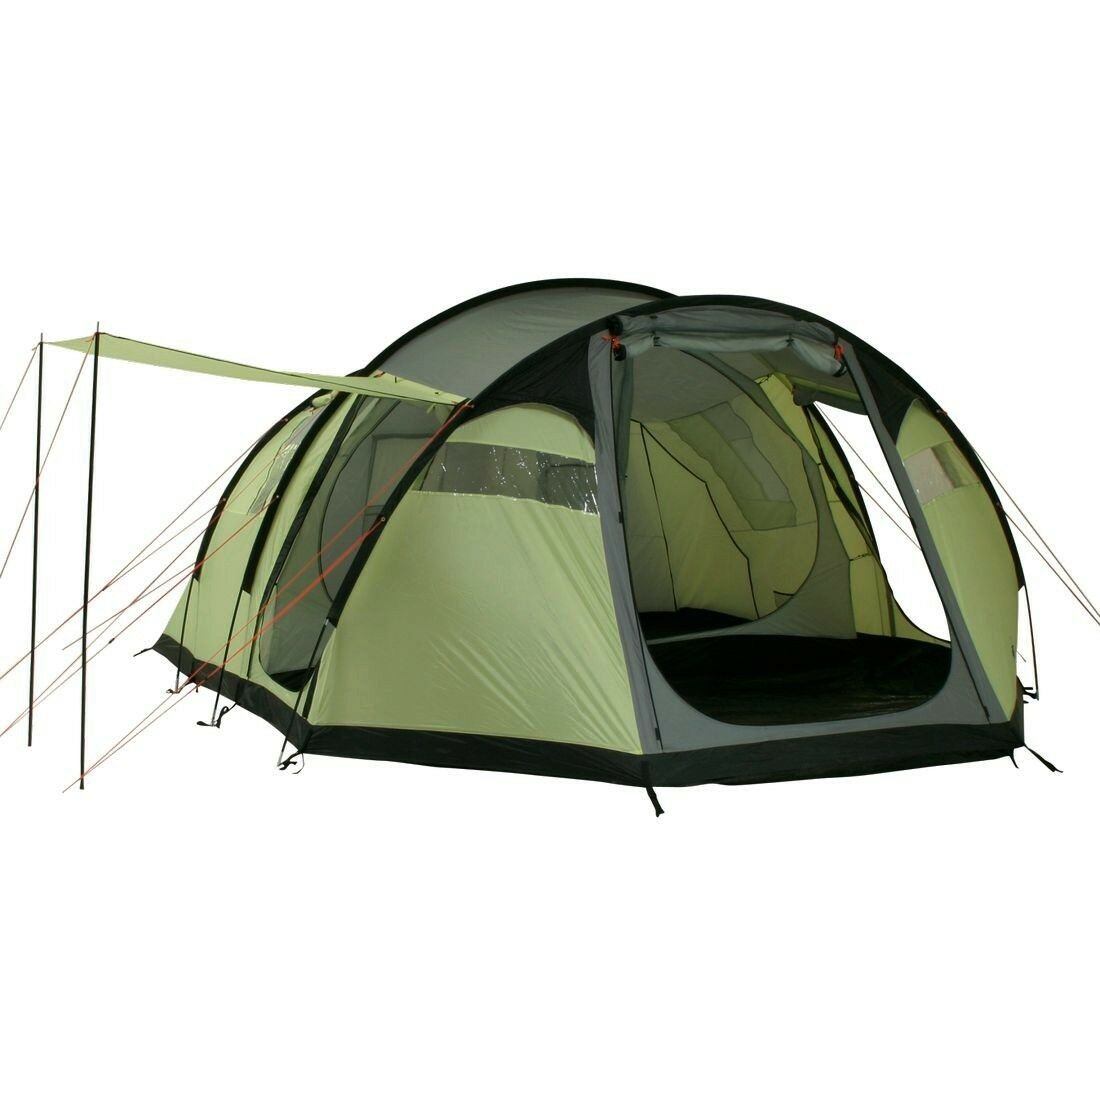 10T Camping-Zelt Wilton, 6 Personen Tunnelzelt, Familienzelt mit 5000mm